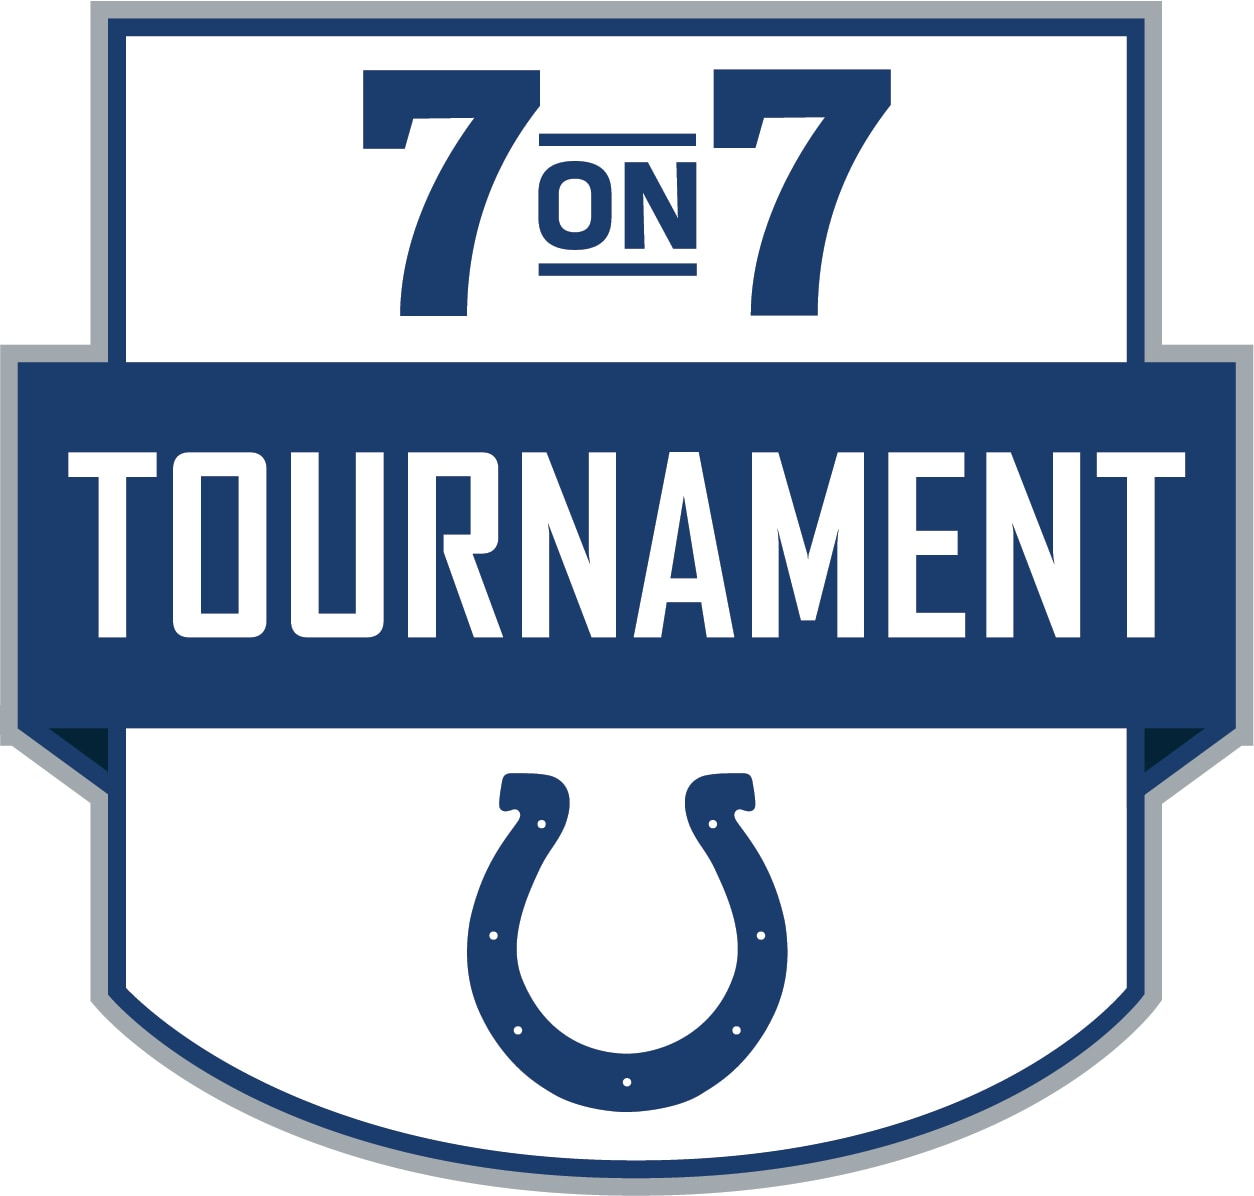 7-on-7 Tournament